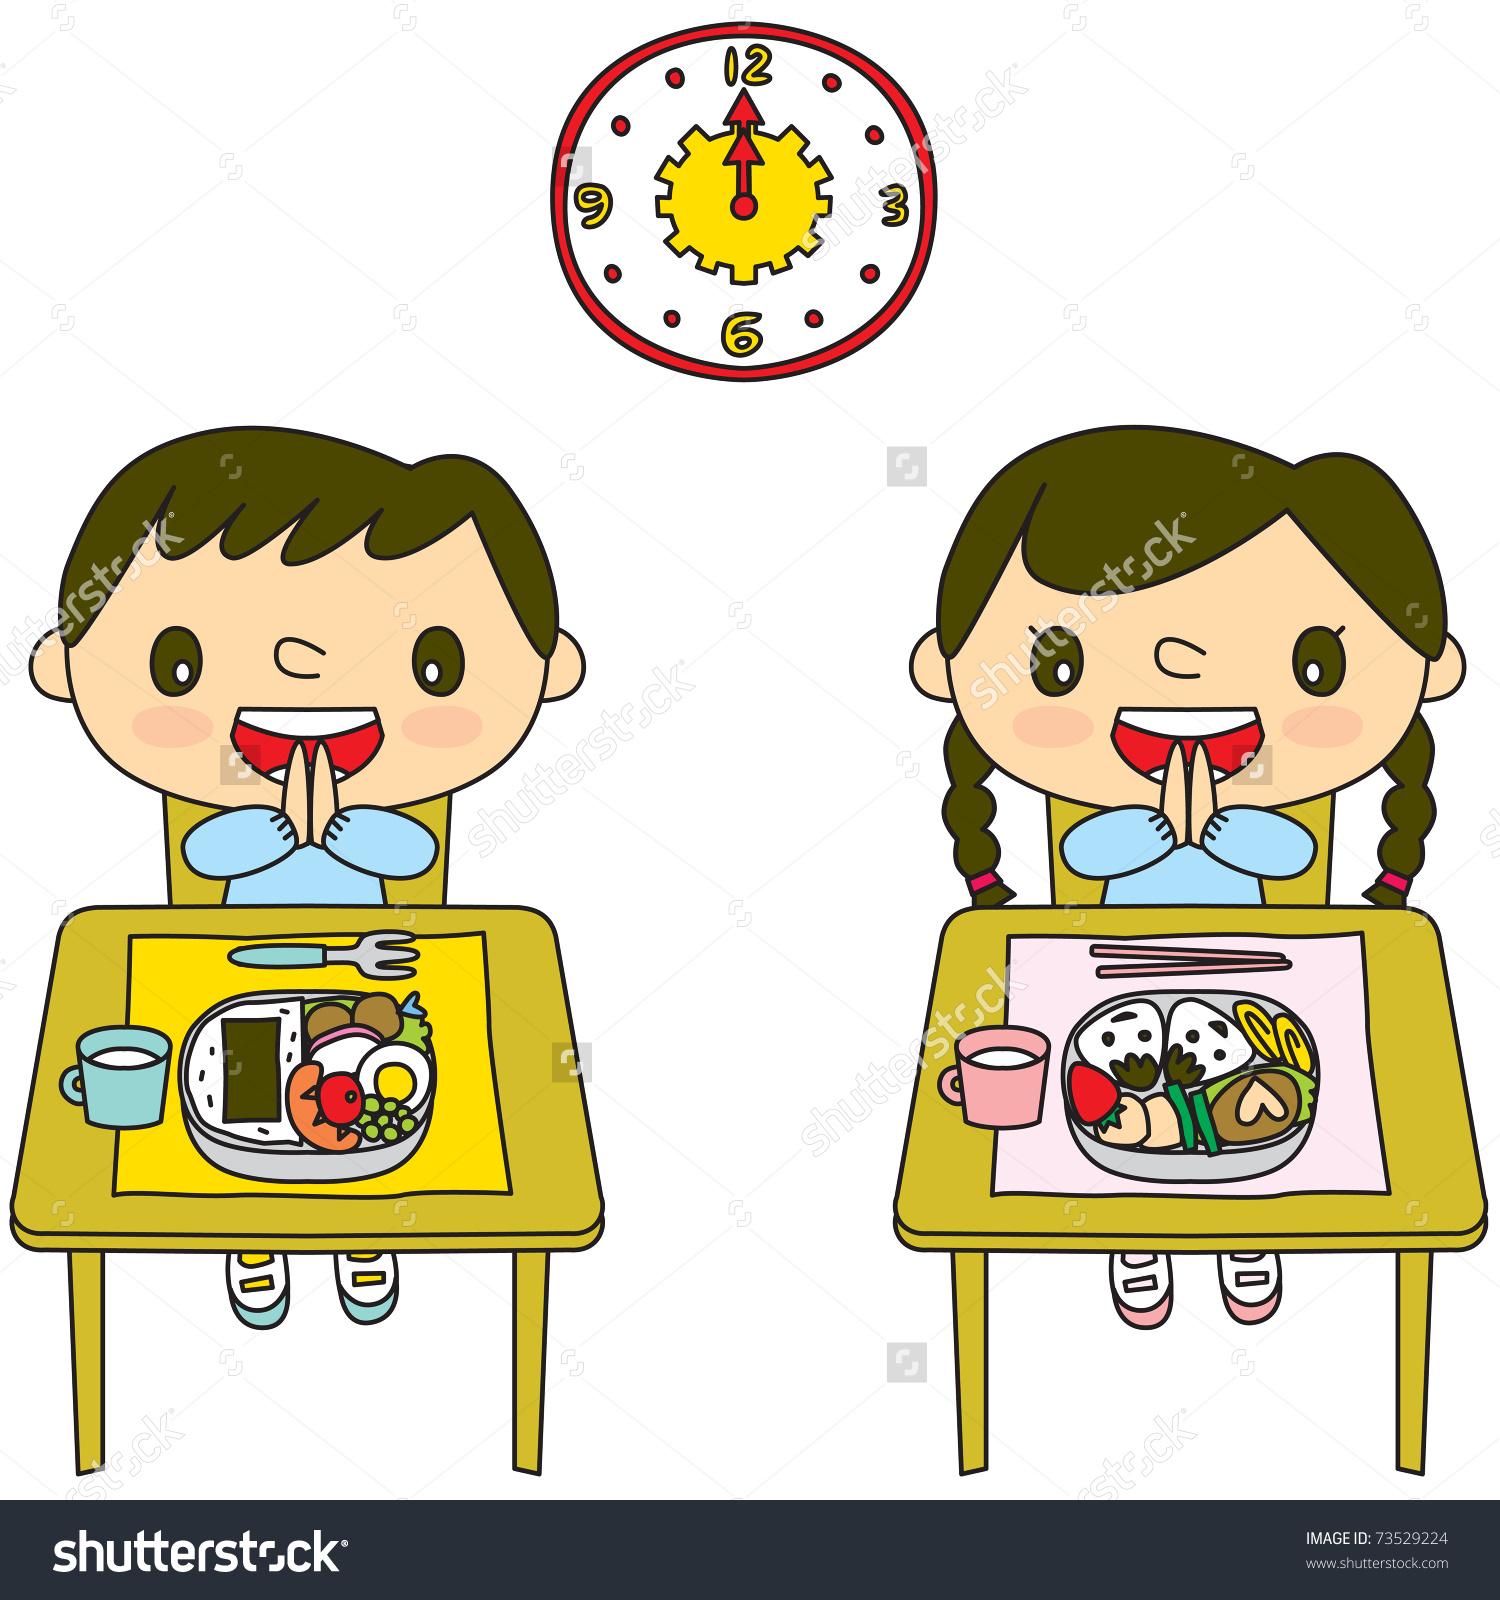 Cafeteria clipart cartoon. Cilpart marvelous design inspiration